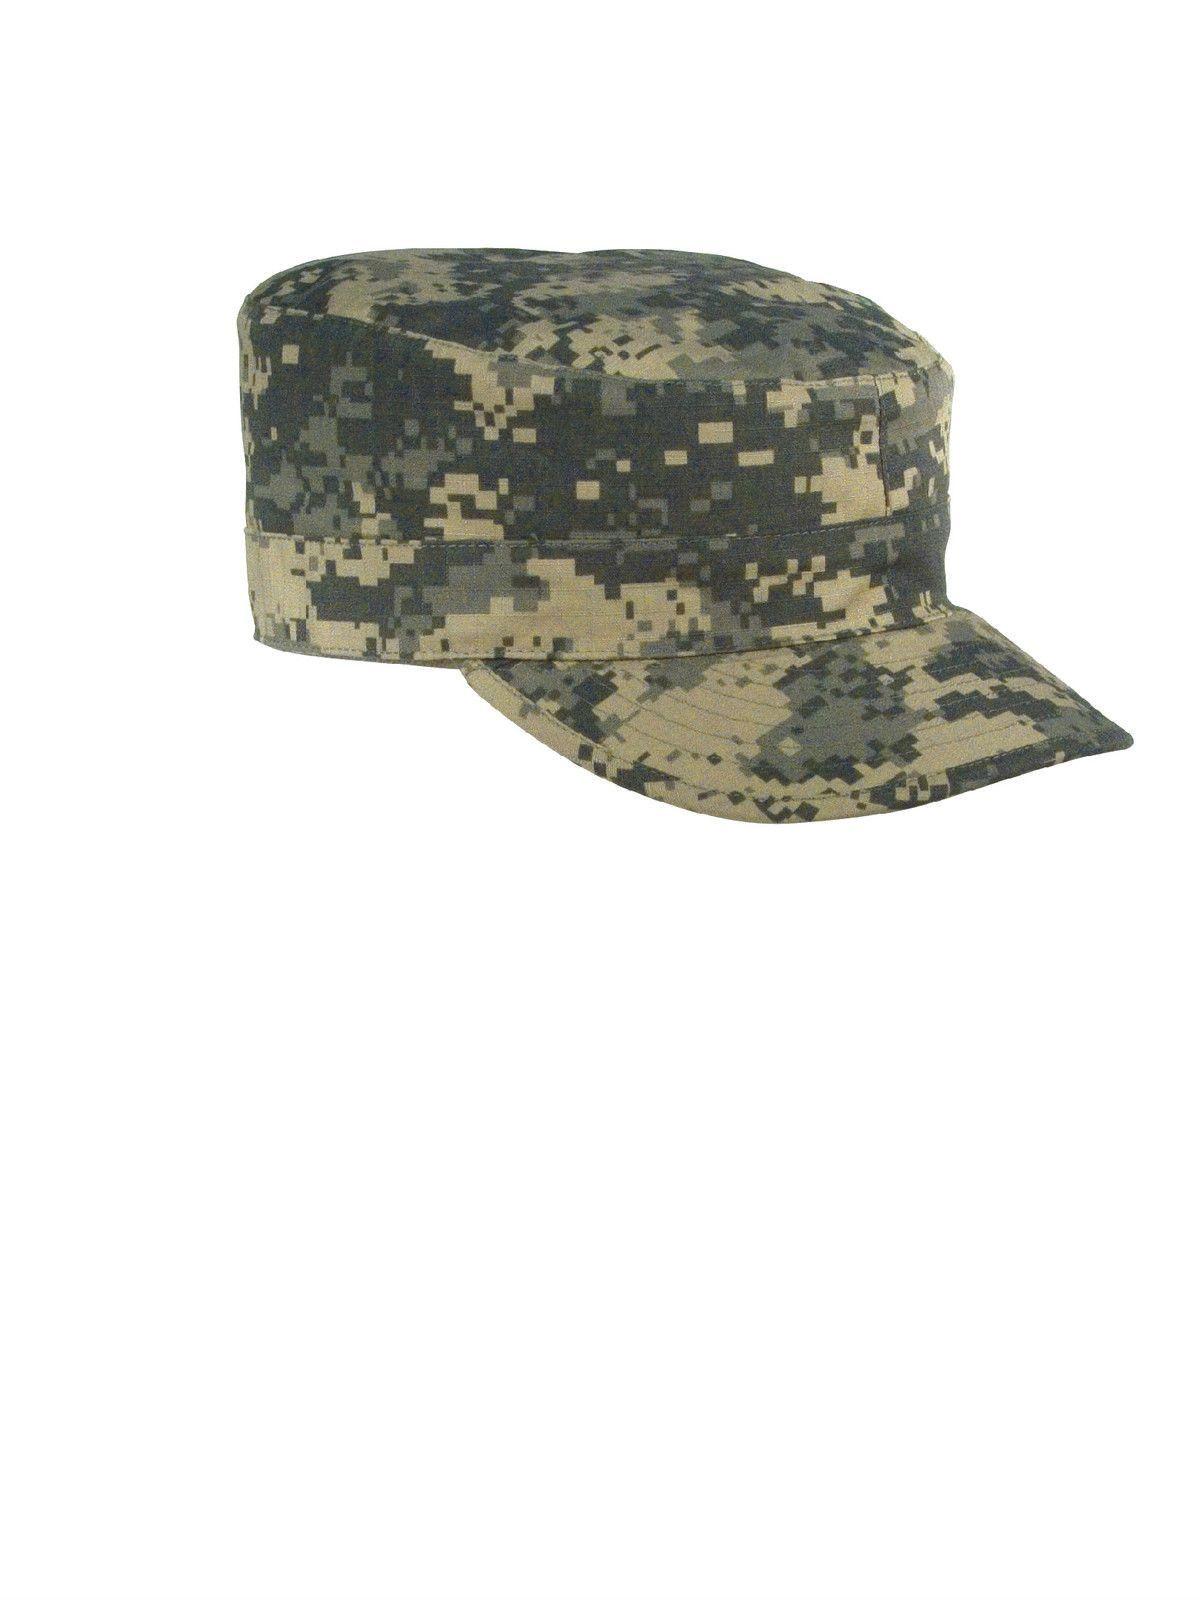 3543c430d2f 2 Ply Army Ranger Caps - Gov Spec Military Fatigue Hat w  Map Pocket ...